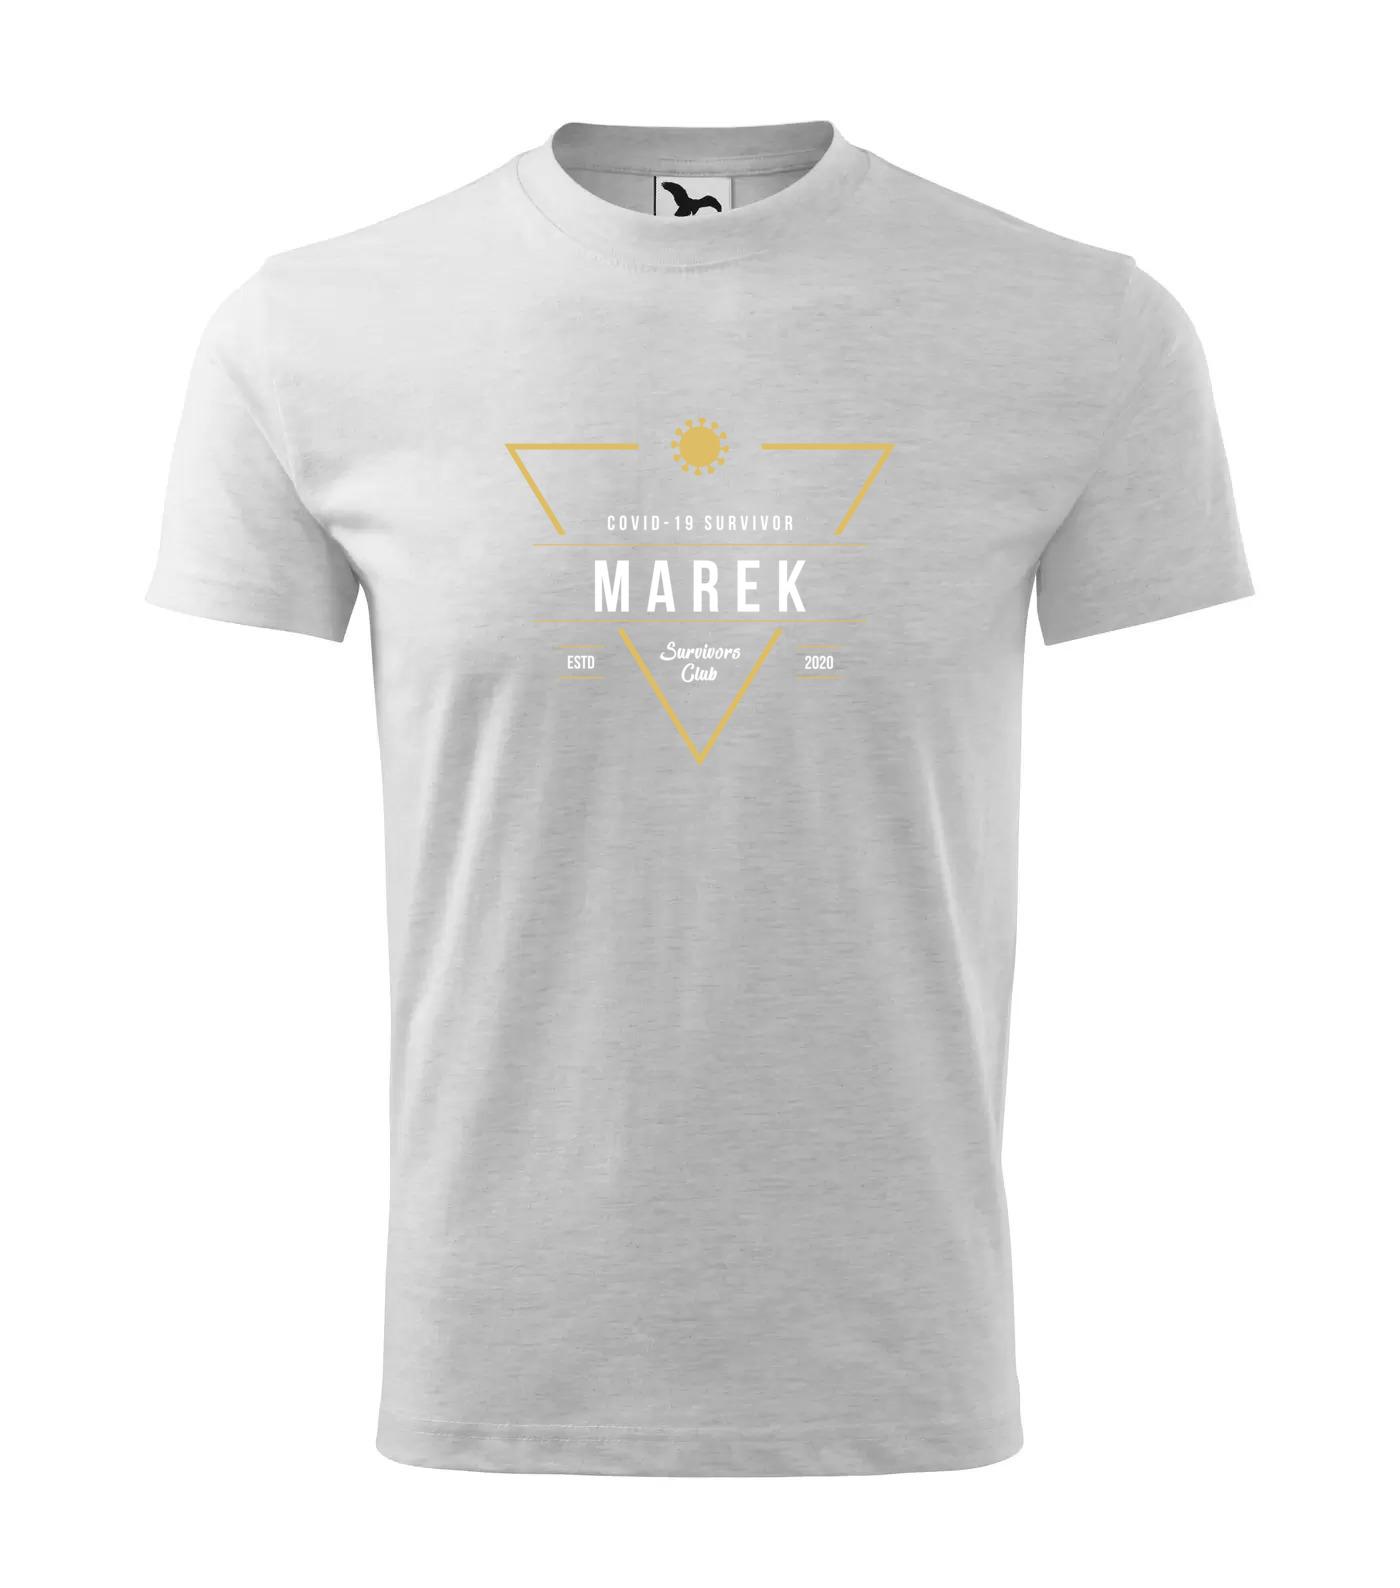 Tričko Survivor Club Marek